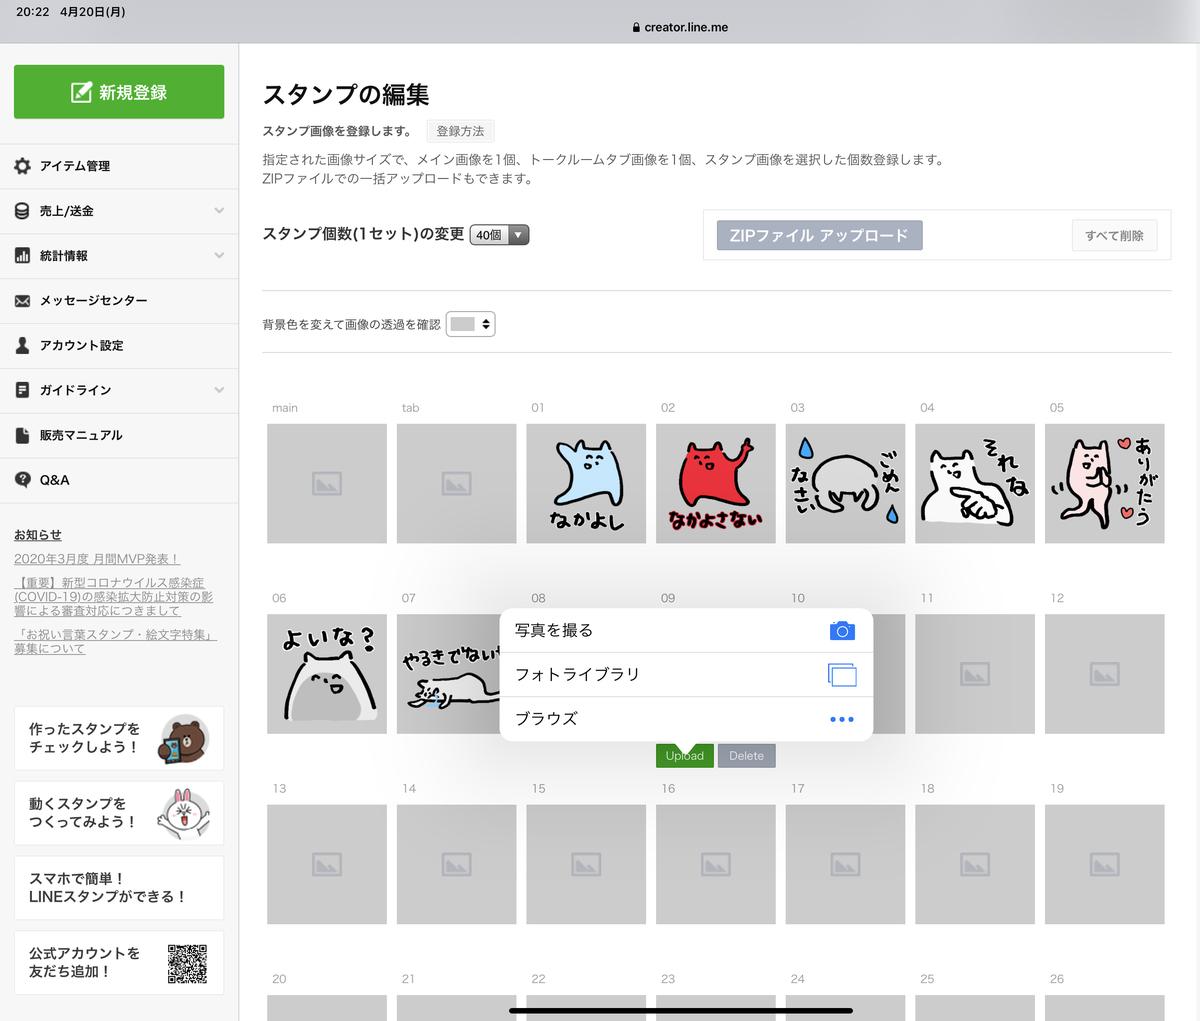 f:id:NAKAYOSHI:20200428112442j:plain